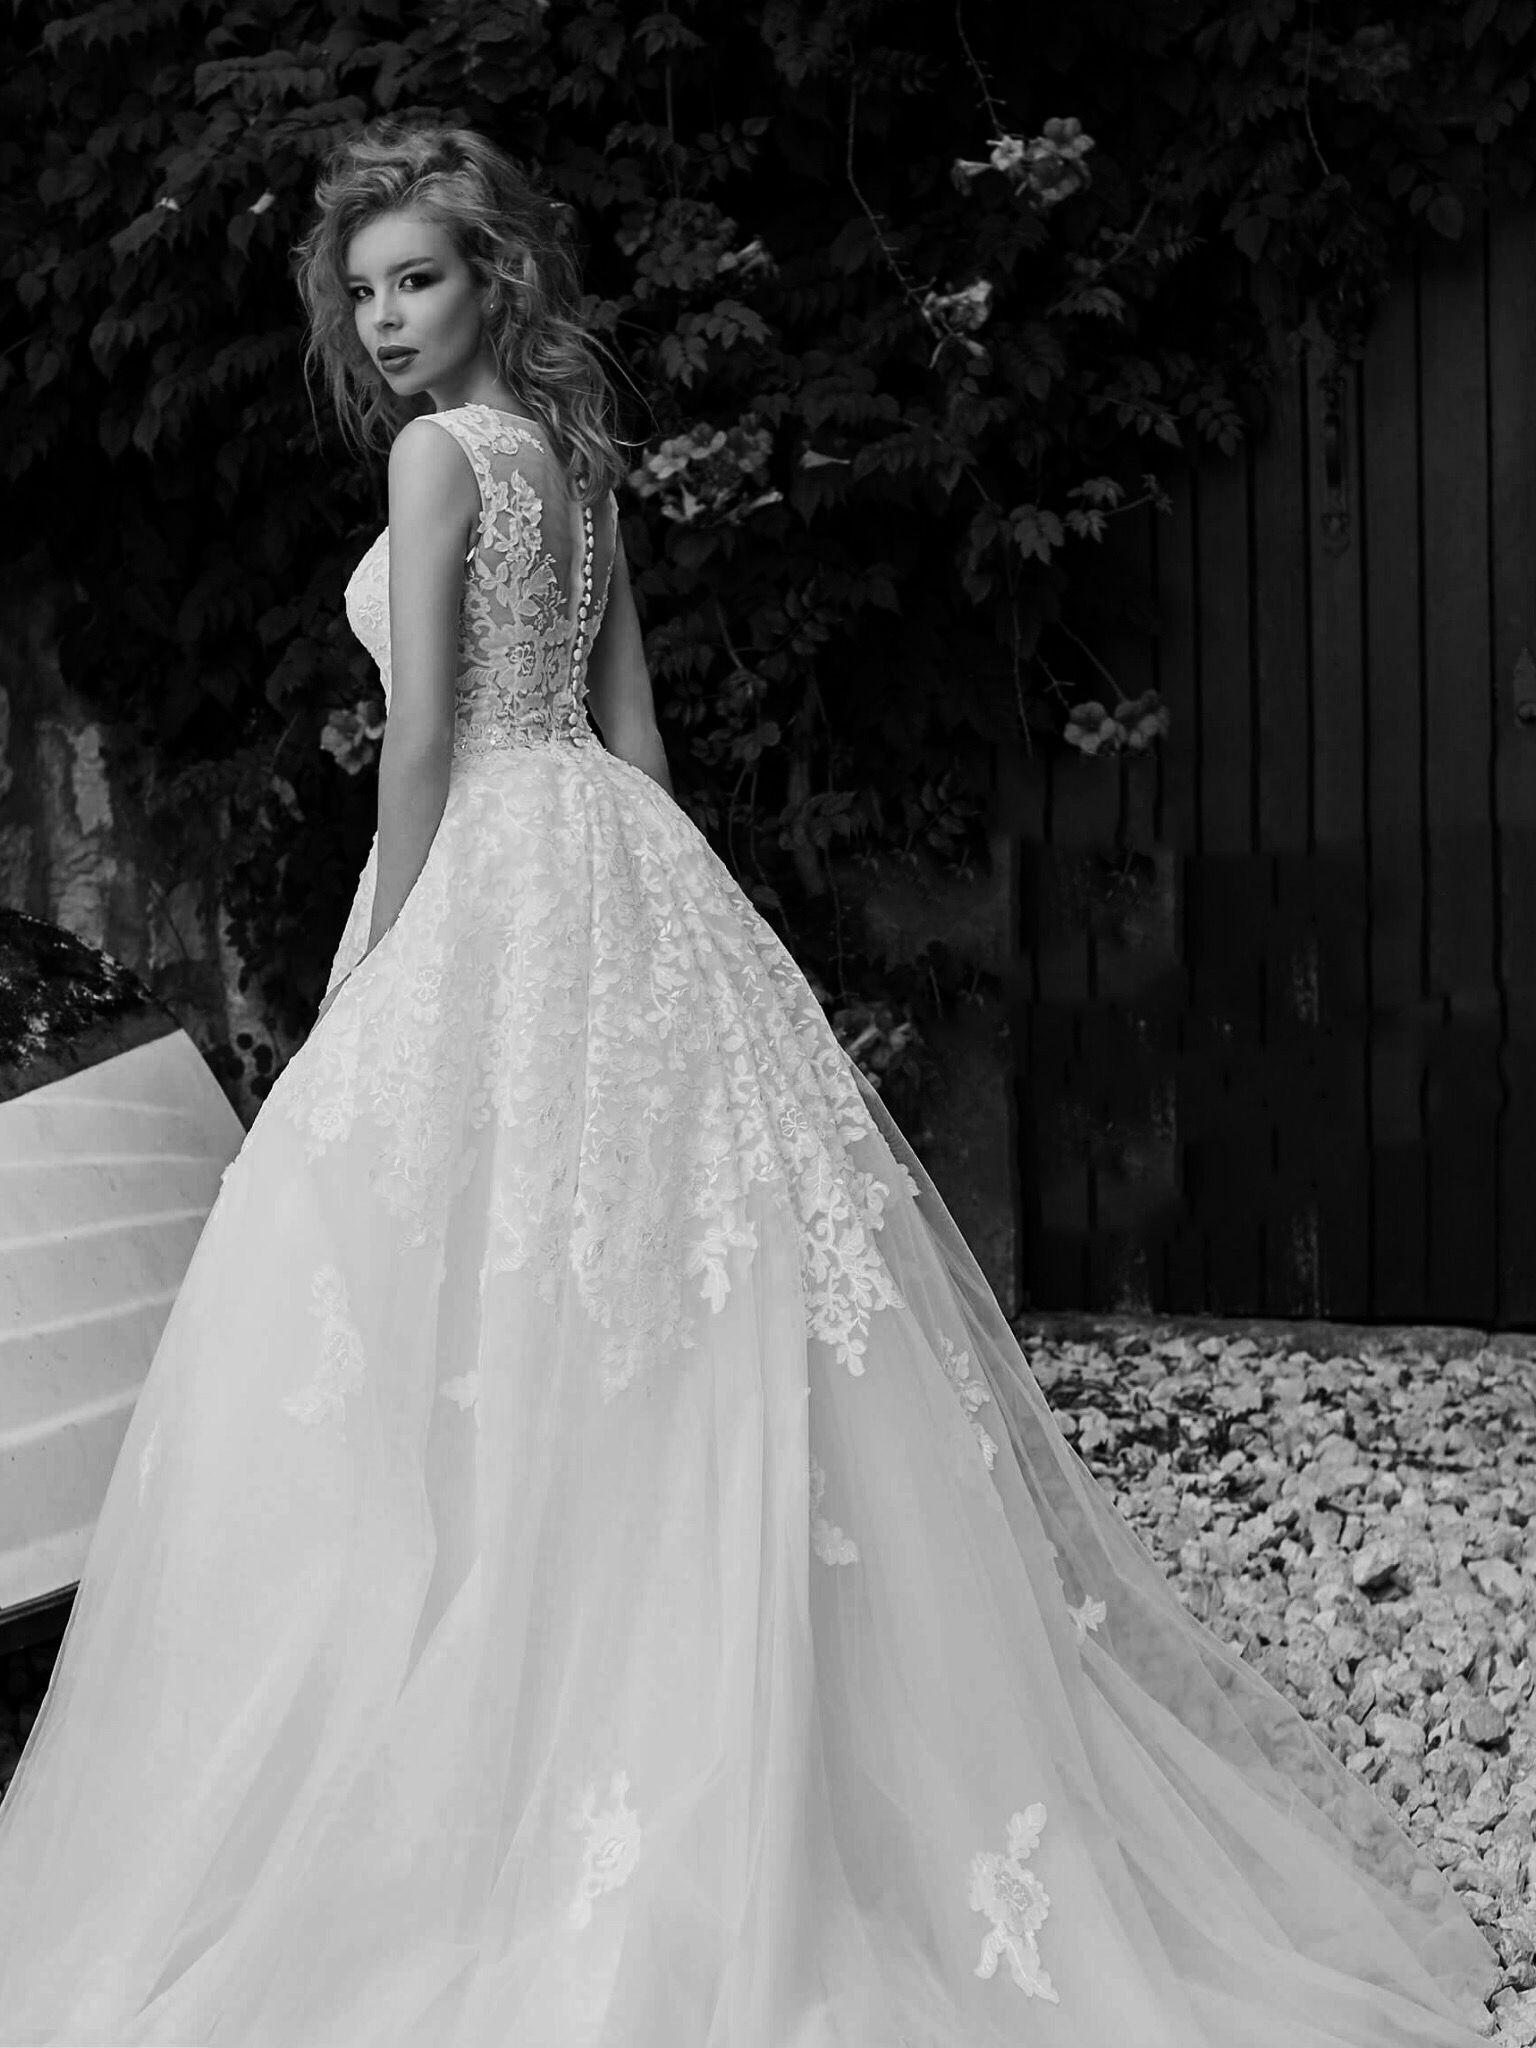 ef4cf2e5ff6c Collection 2018 wedding dresses. www.istoriesgamou.gr Νυφικα 2018 ...